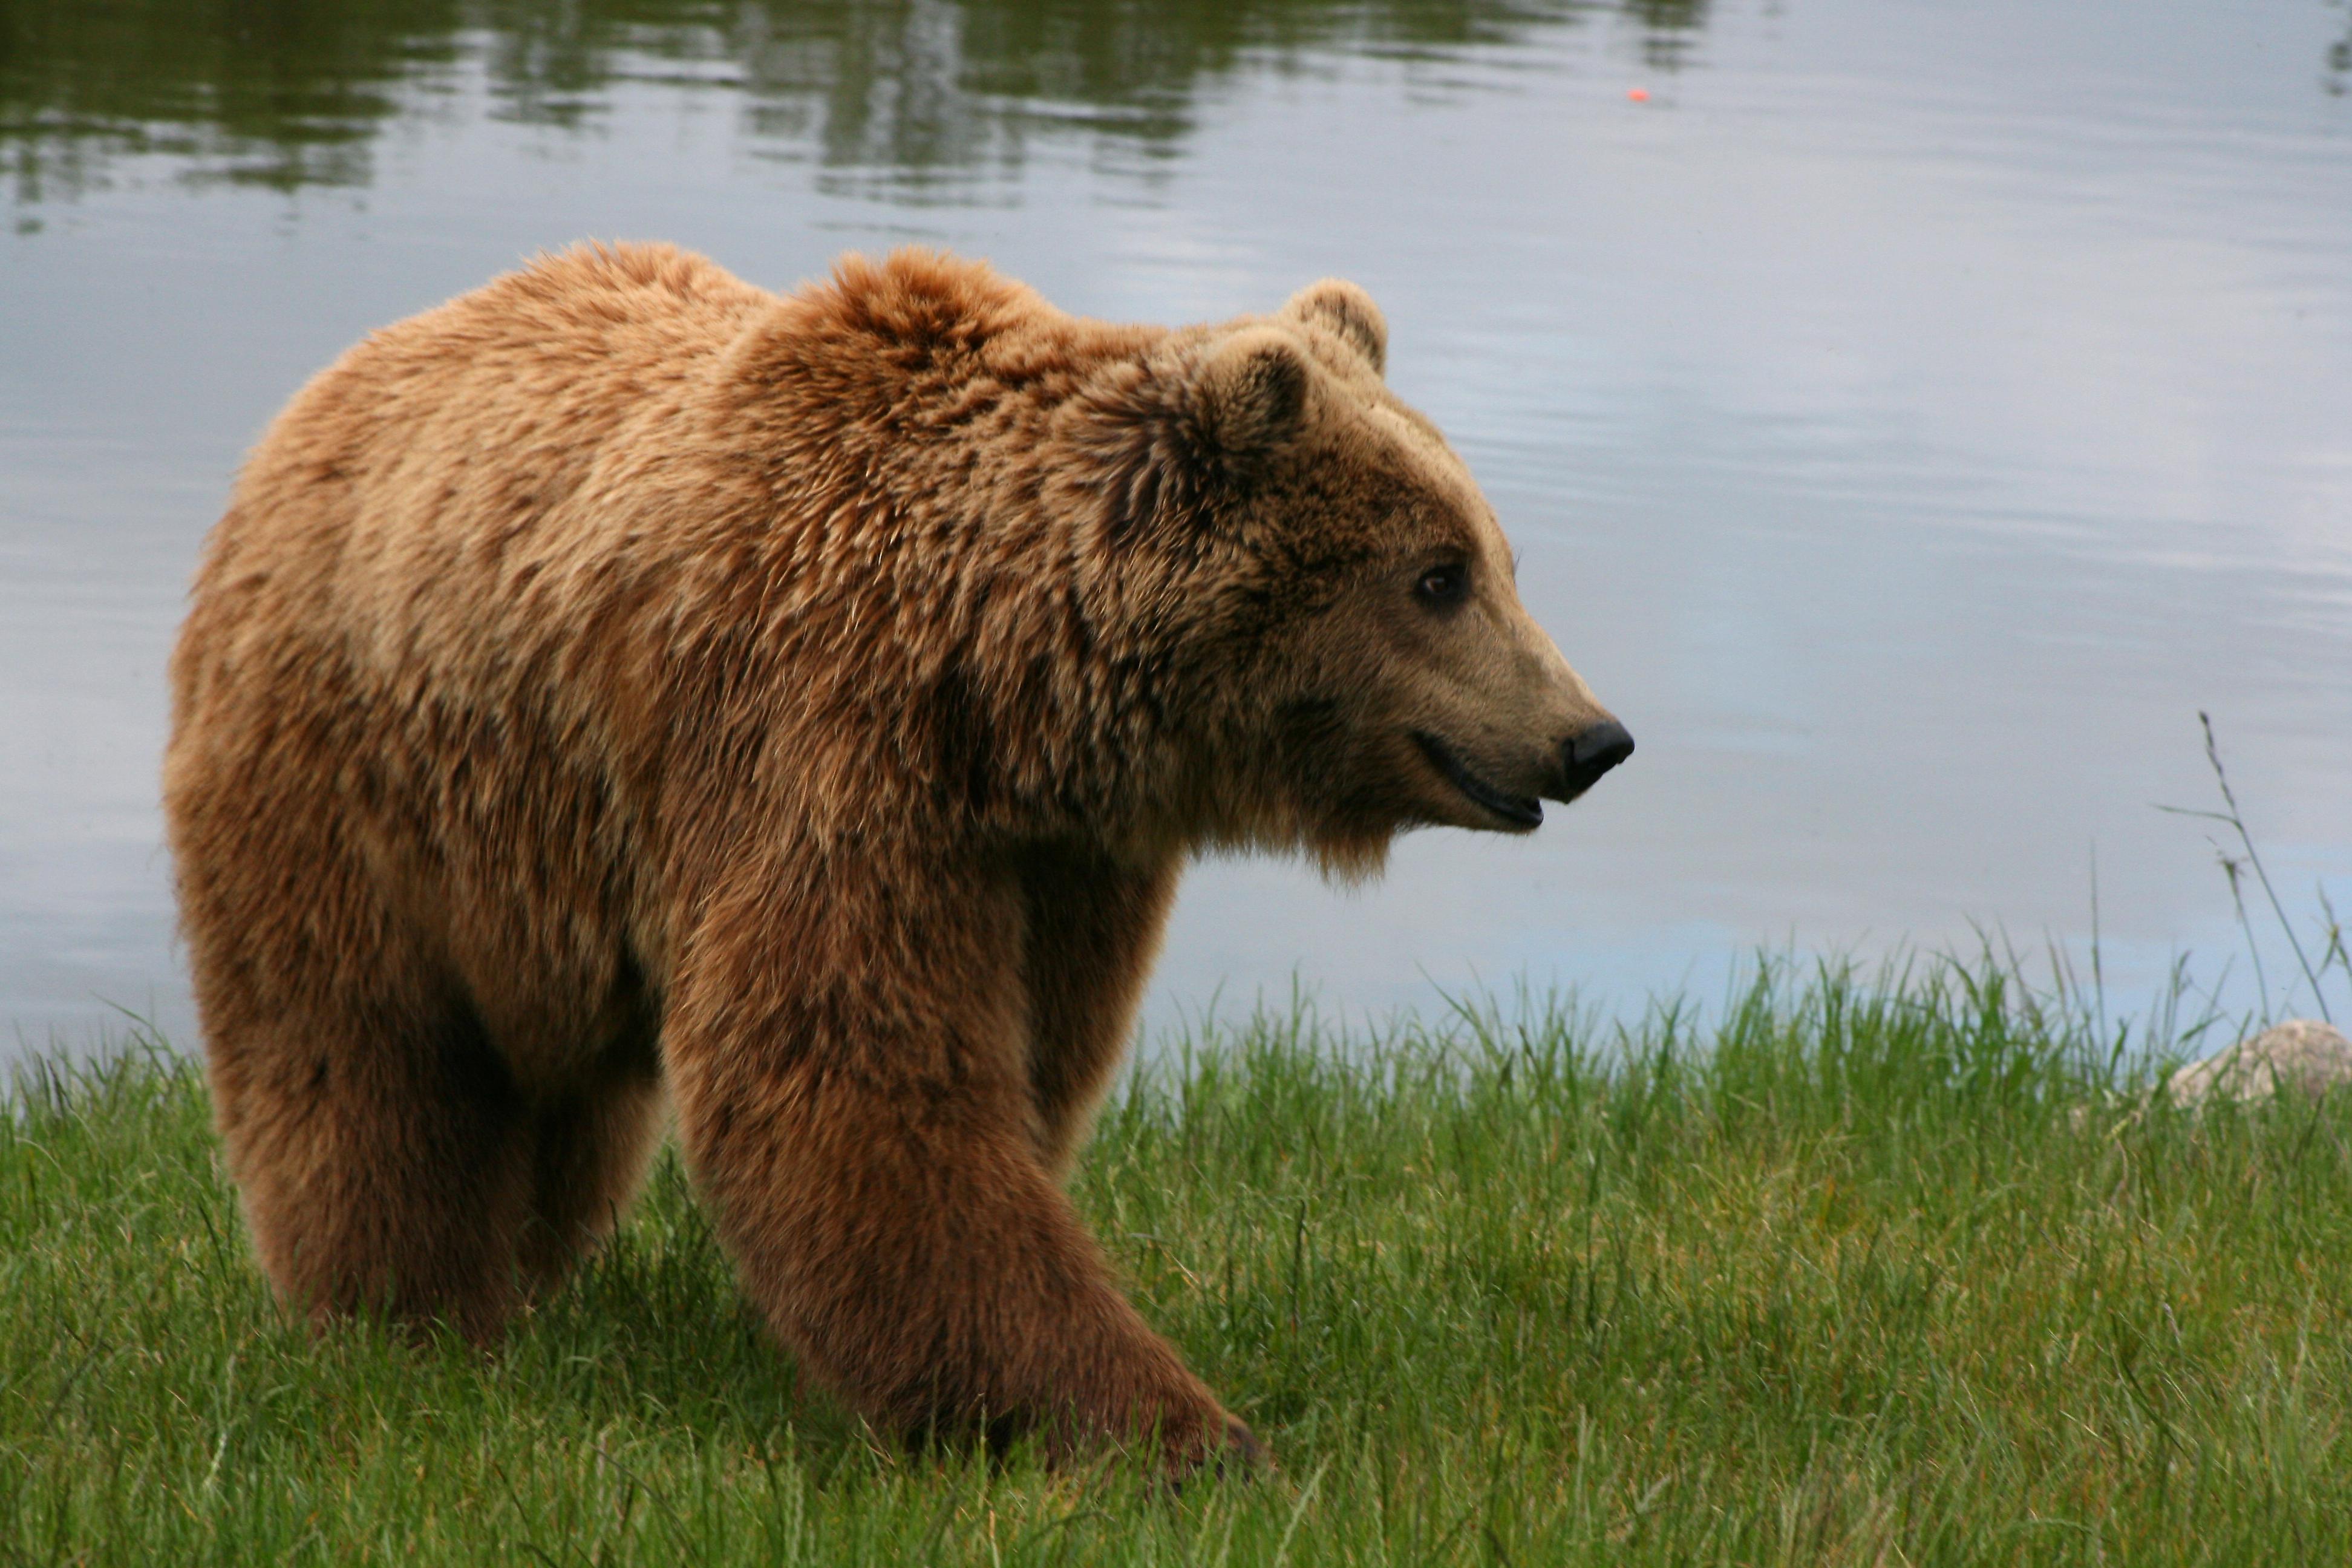 File:Brown bear (Ursus arctos arctos) smiling.jpg - Wikimedia Commons Bear